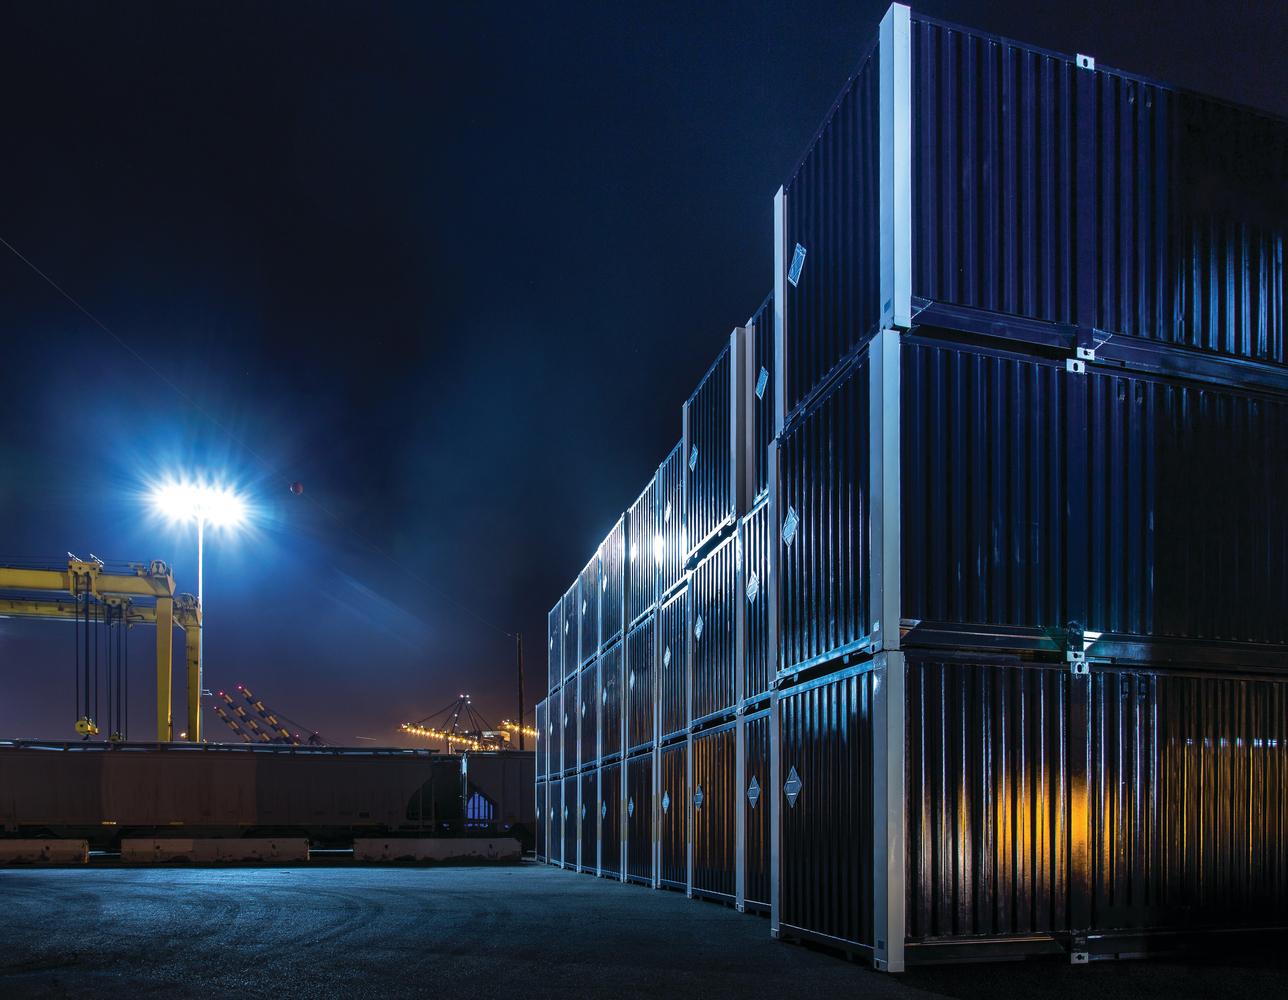 TFX4 LED 40K MVOLT IS DDBXD_Shipyard.jpeg